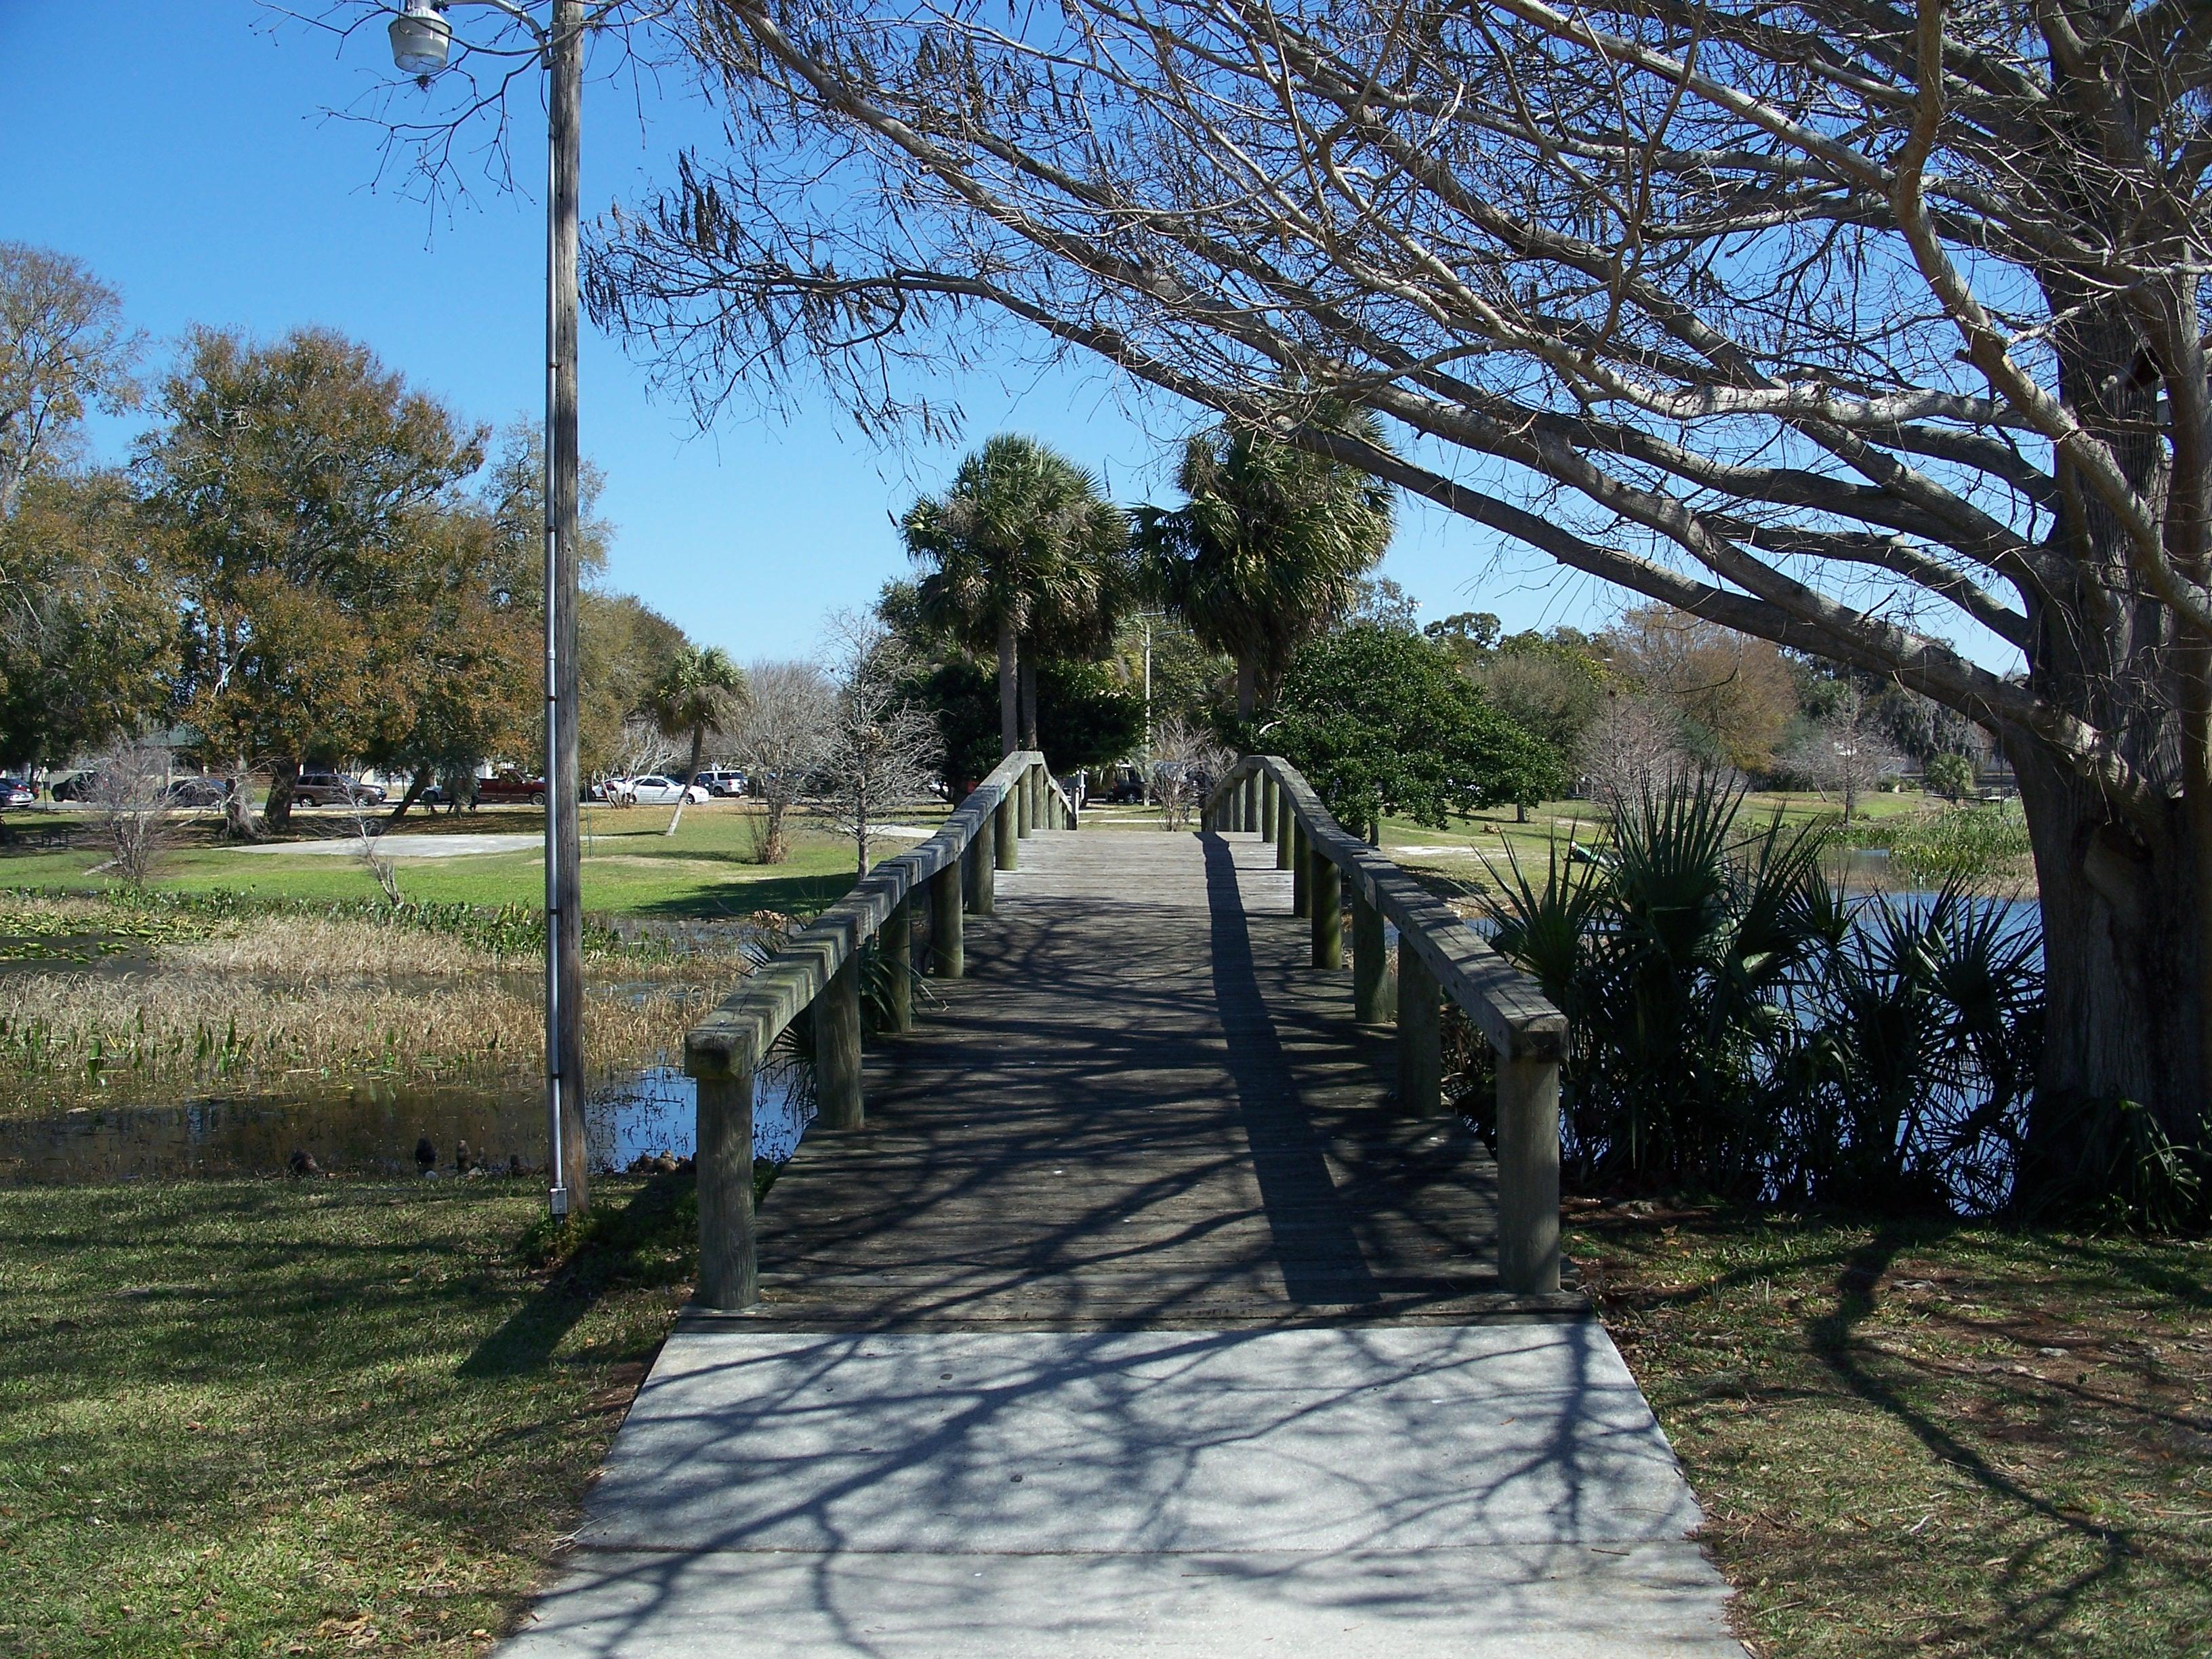 Filename: Leesburg_FL_Venetian_Gardens_bridge07